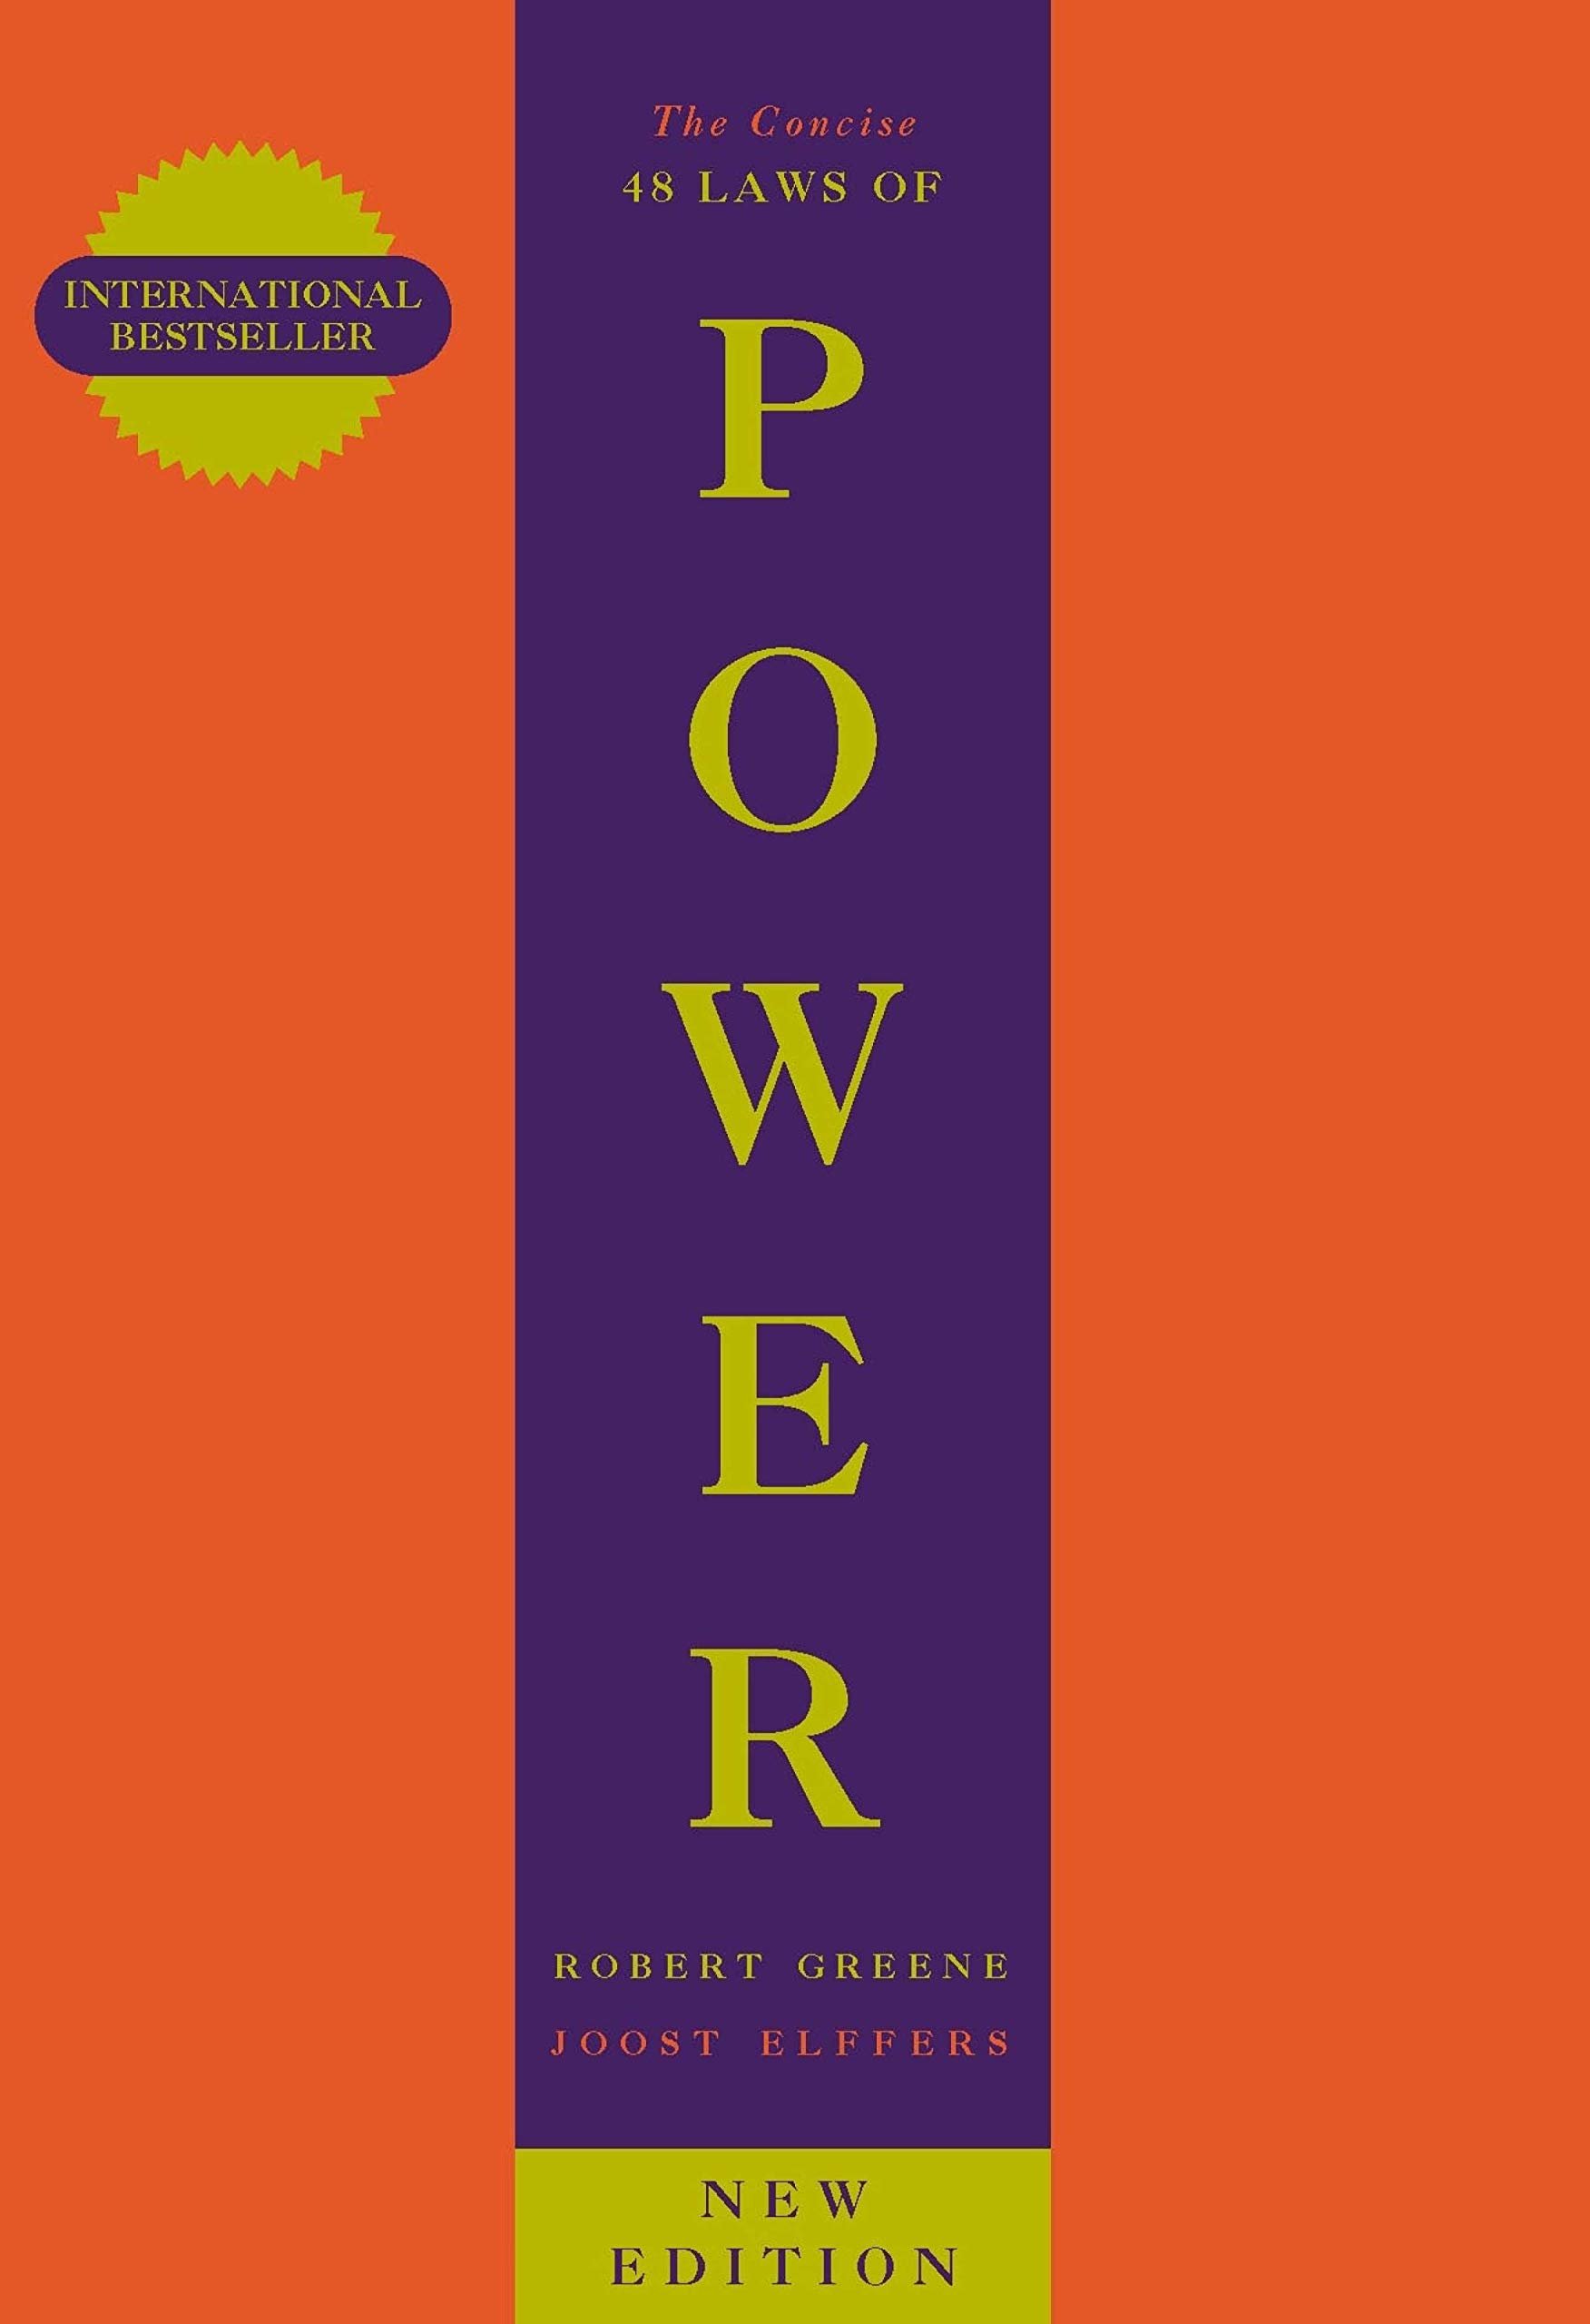 WeTheBlueprint - Robert Greene '48 Laws of Power' Book Cover - 13'' x 19'' - Luxury Art Print